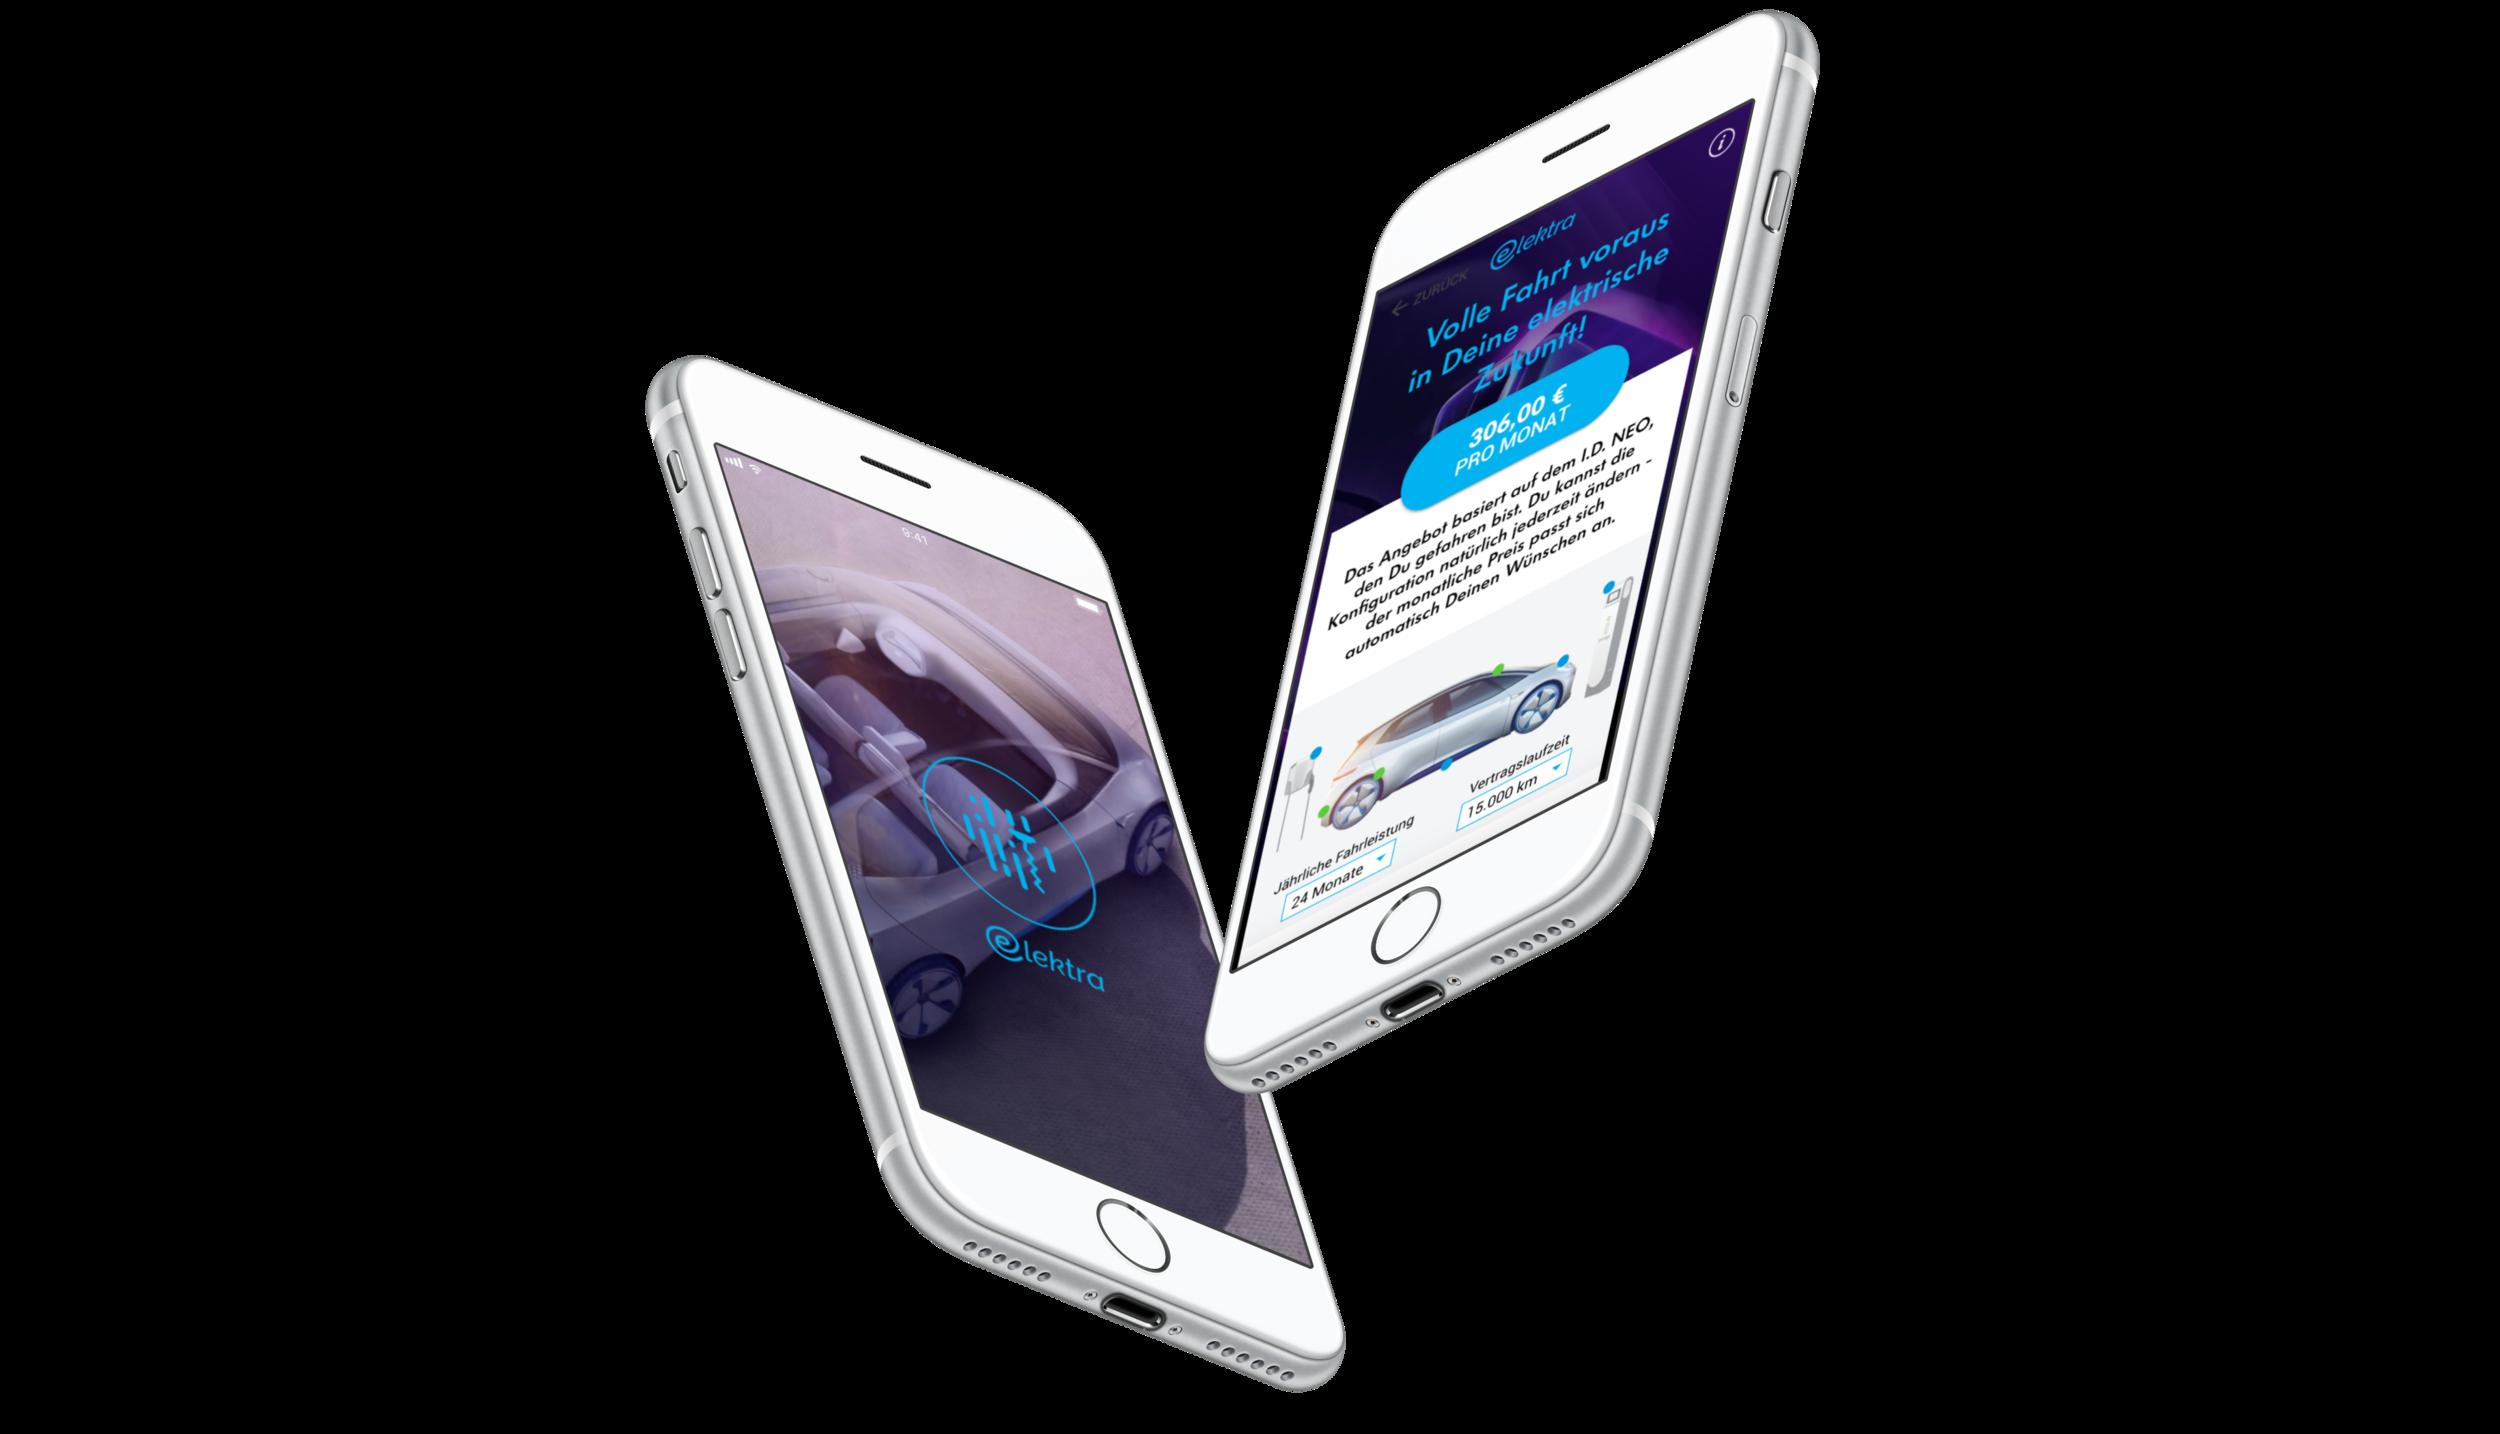 elektra Hero Smartphone Angle 1@3x.png